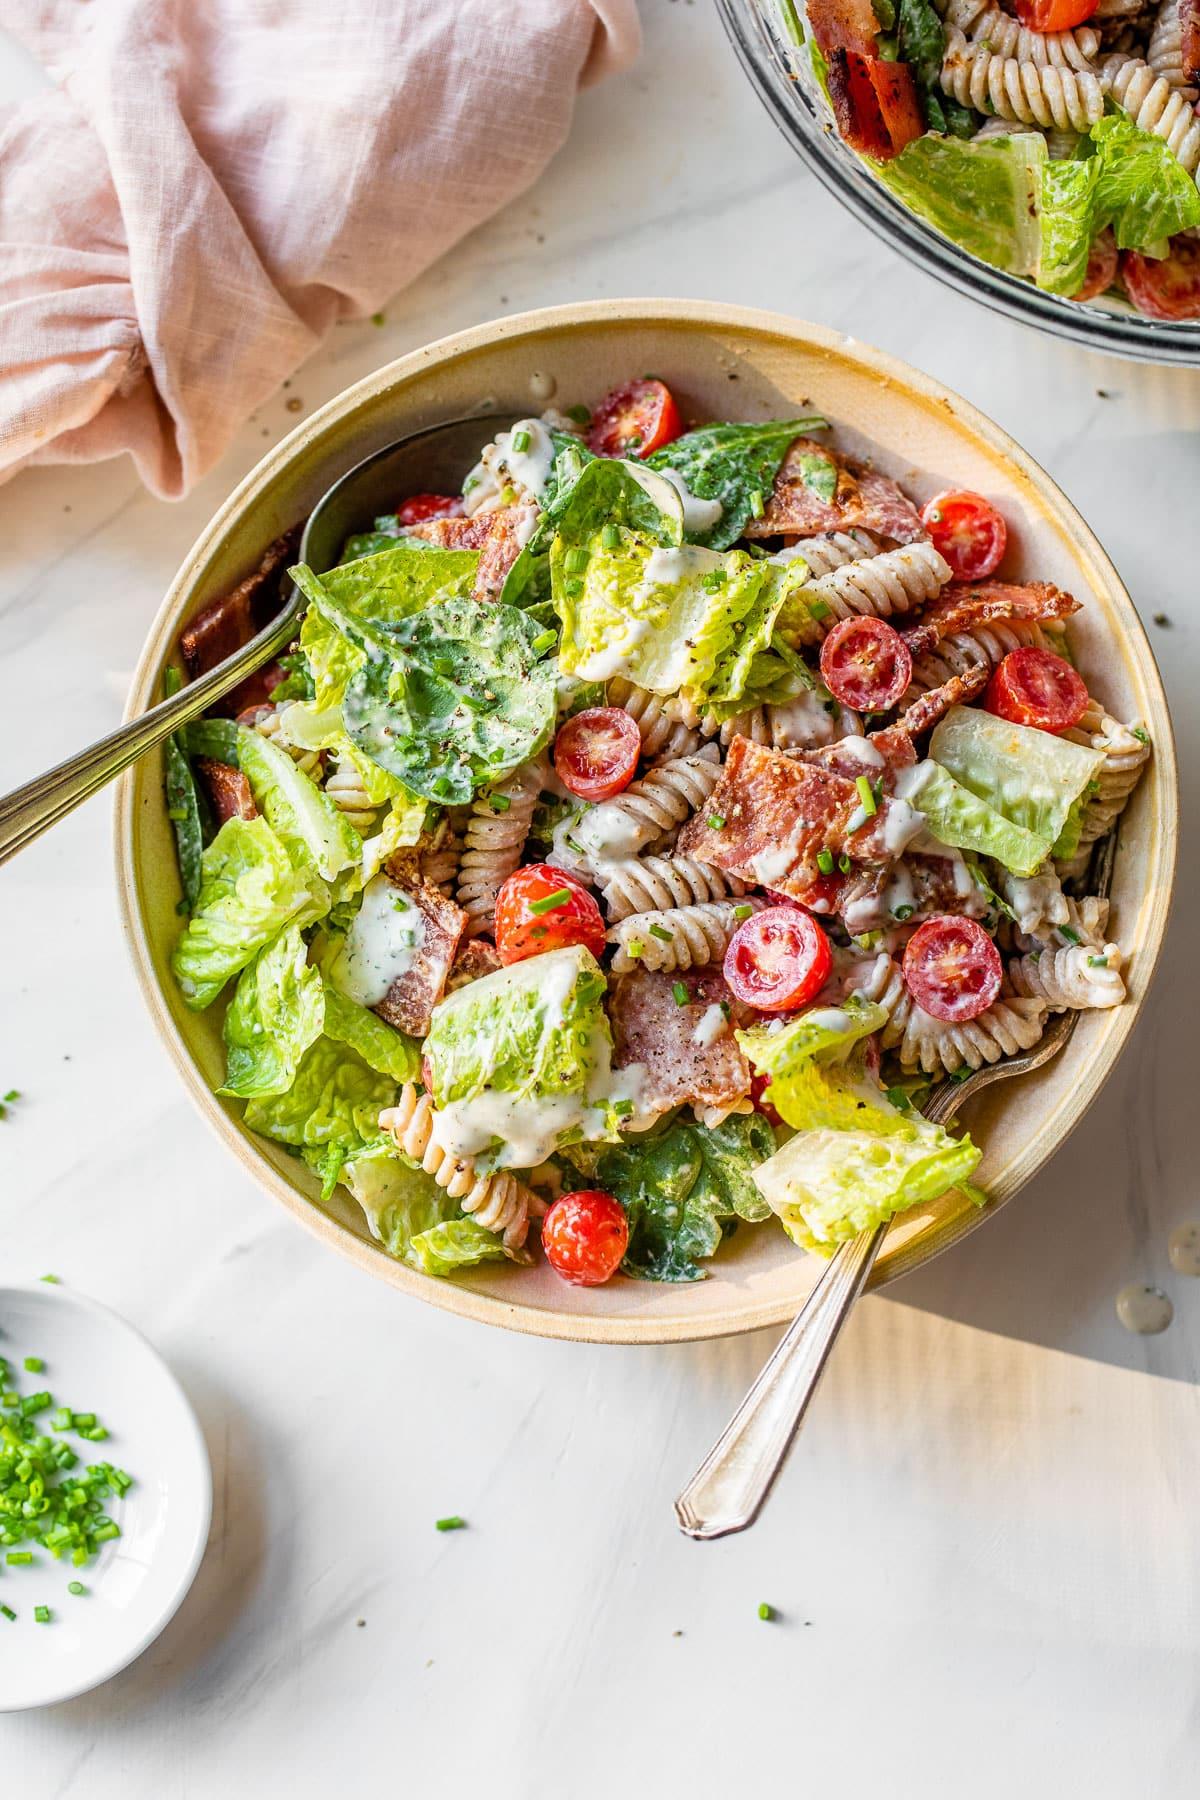 BLT pasta salad no ranch dressing